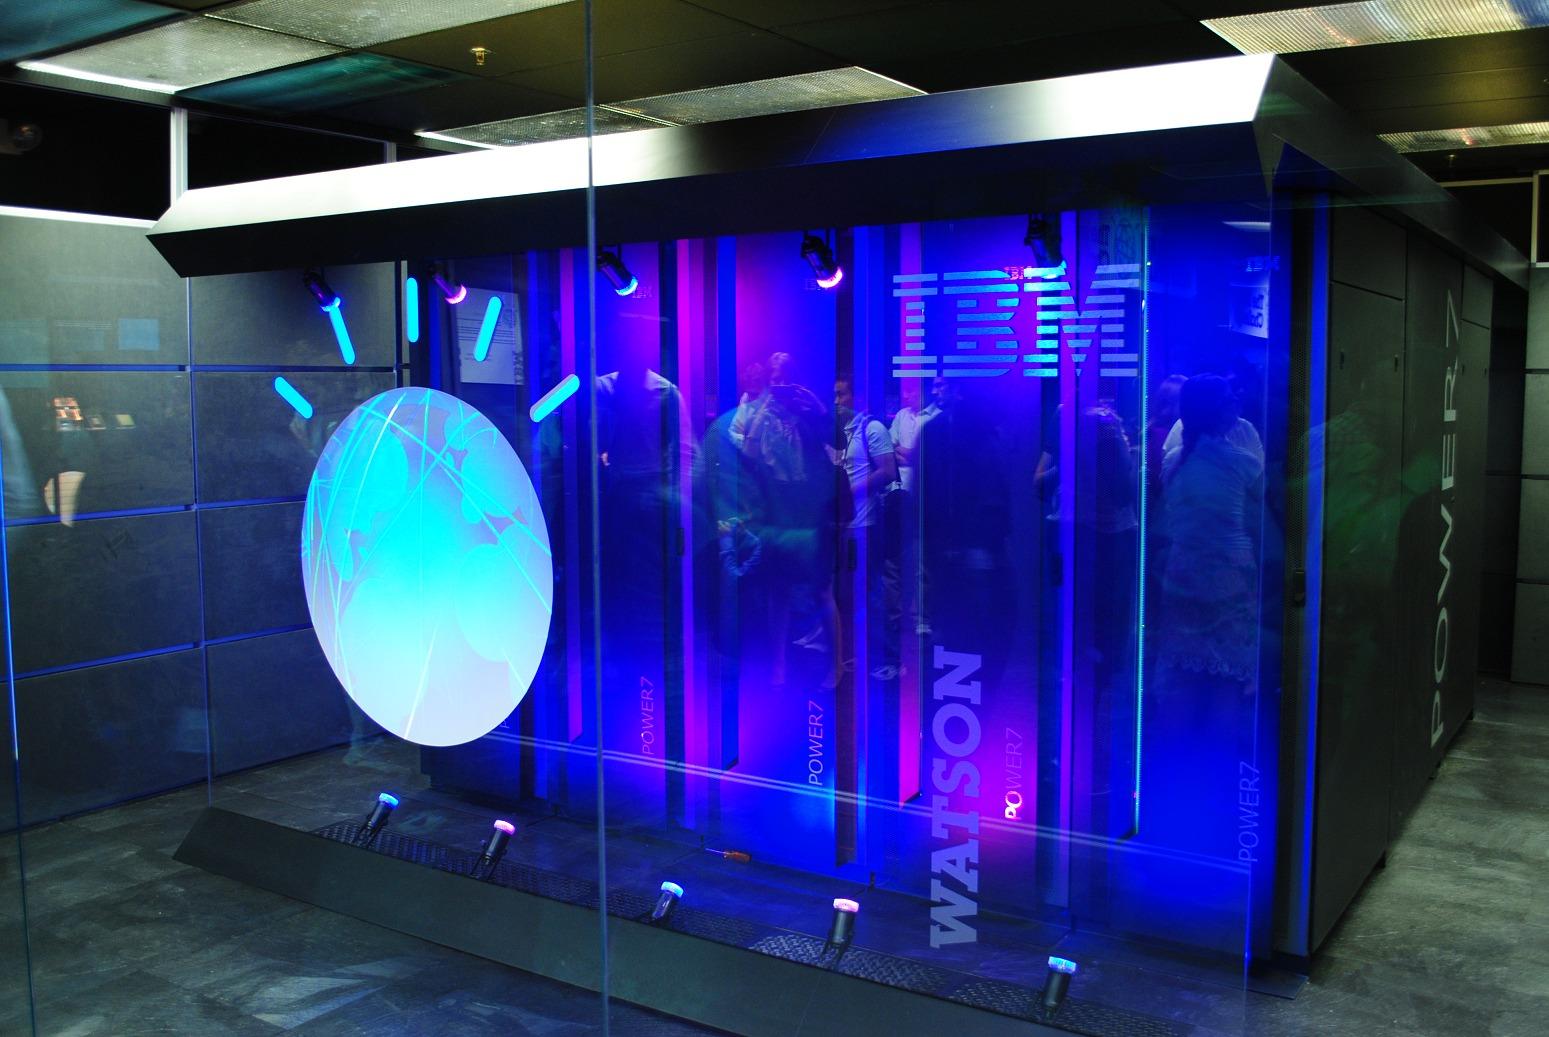 IBM Watson hardware, IBM Watson cloud analytics